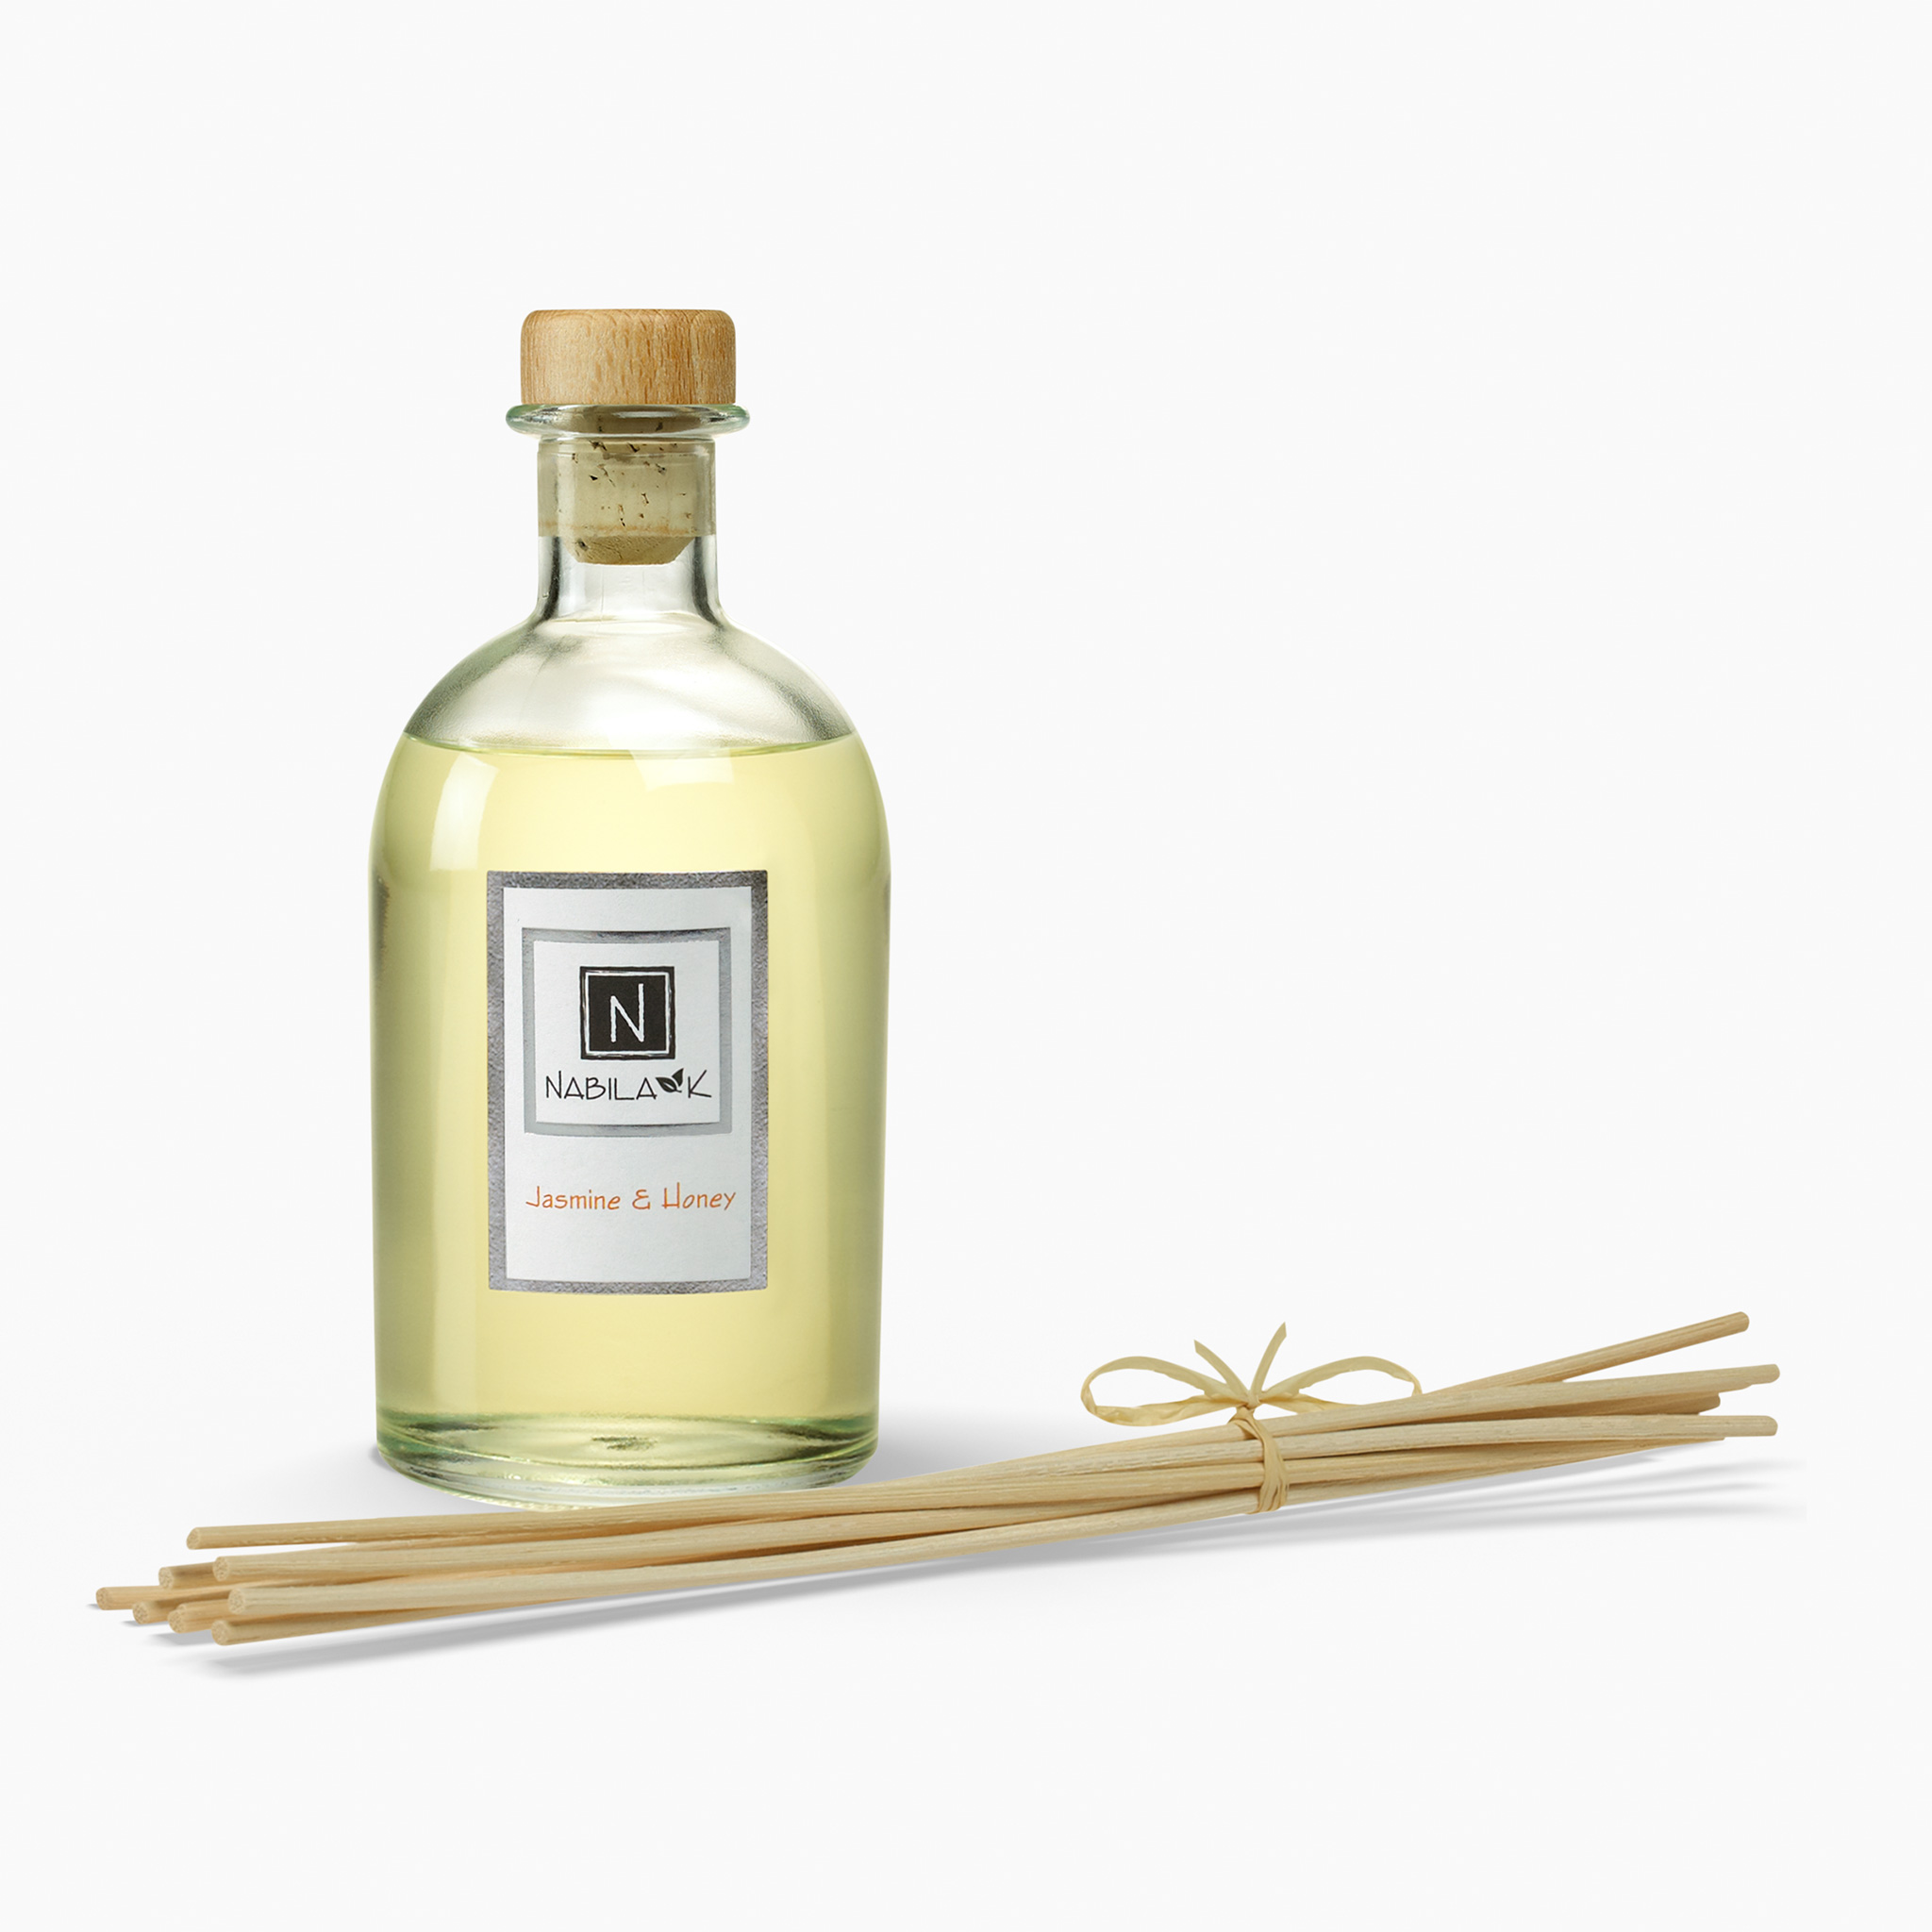 1 Bottle of Nabila K's Jasmine and Honey Diffuser with Reeds